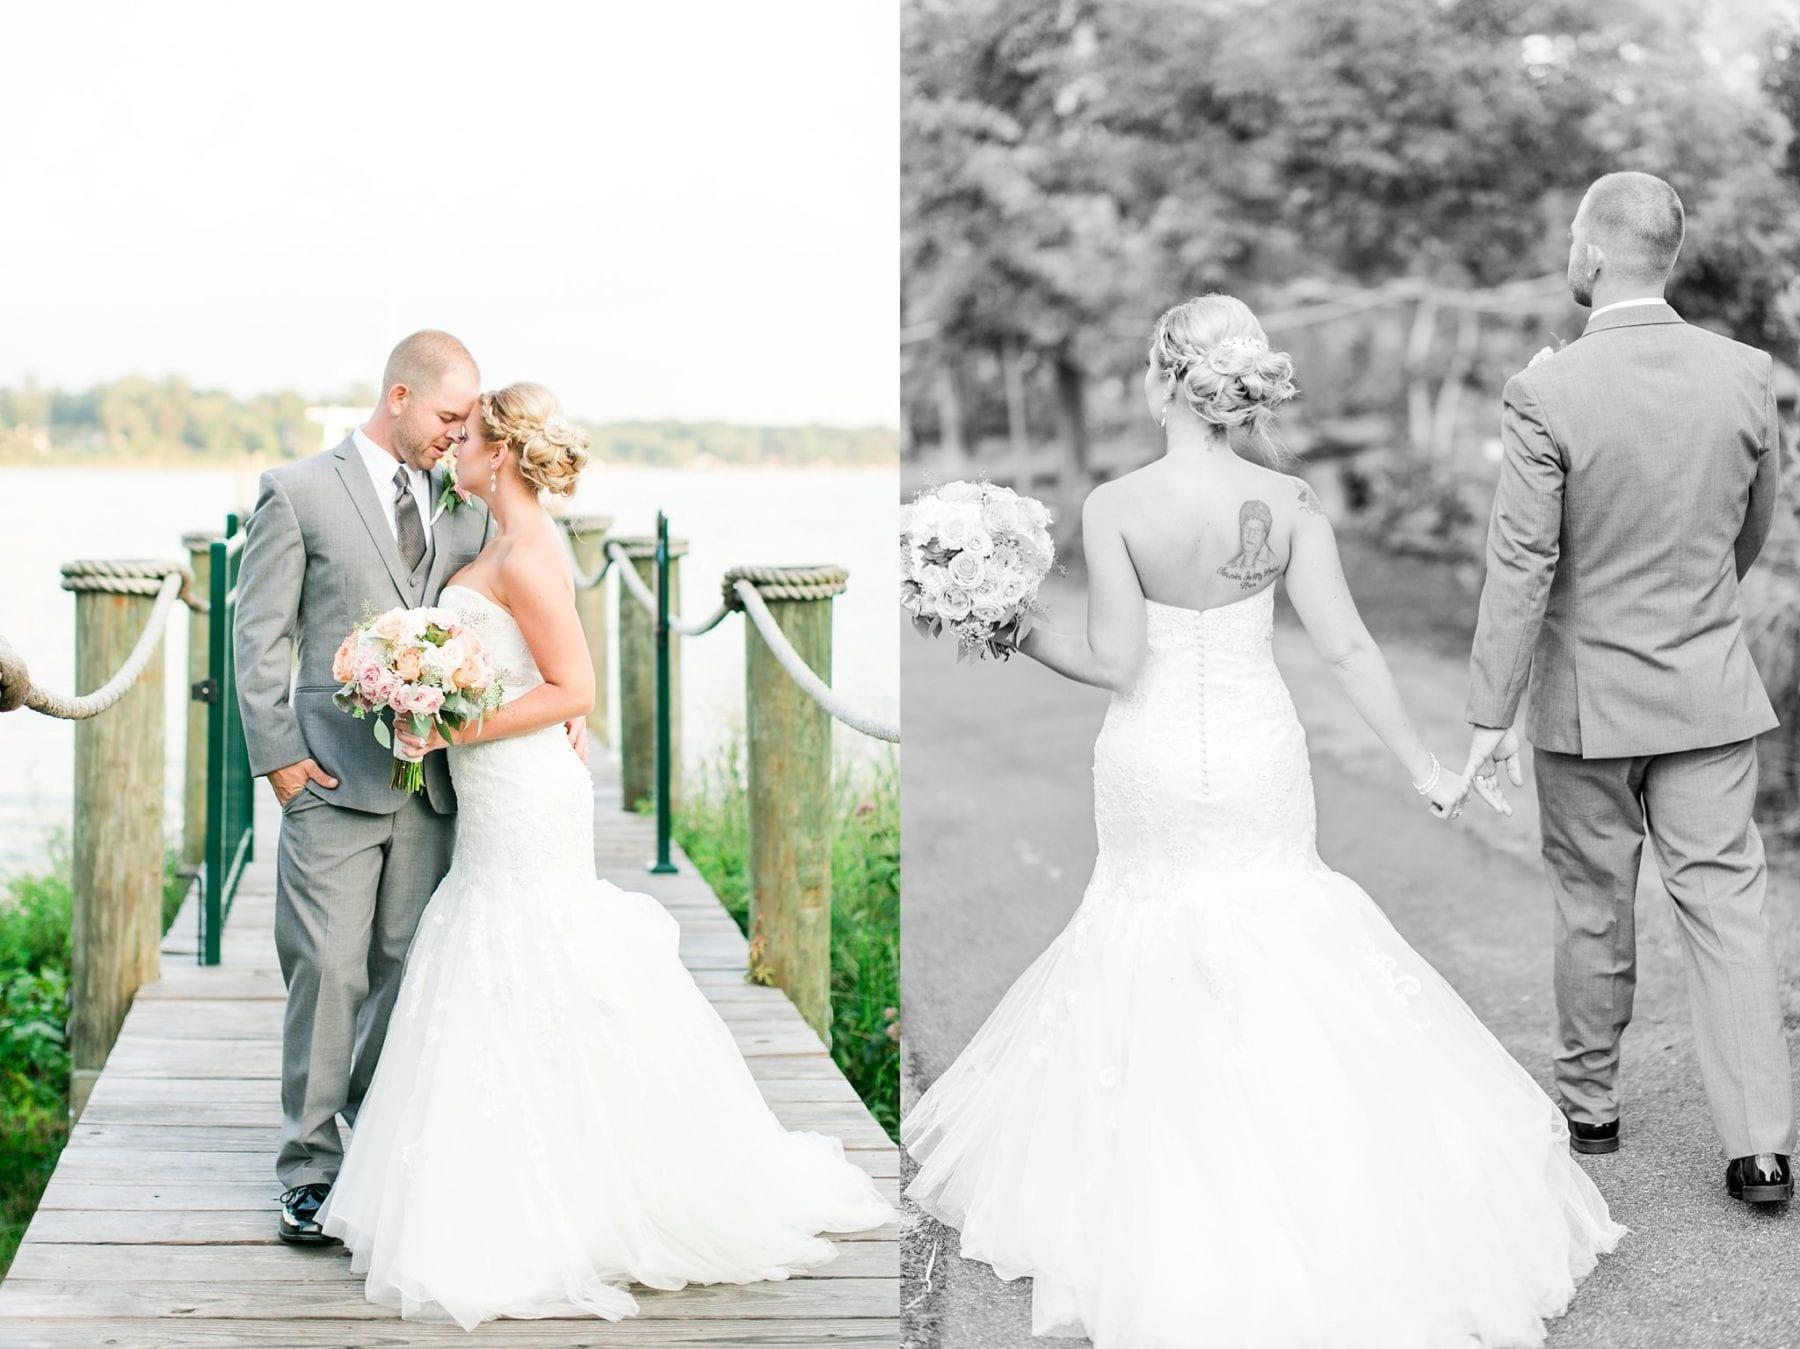 Waters Edge Wedding Photos Maryland Wedding Photographer Megan Kelsey Photography Katie & Conor-524.JPG